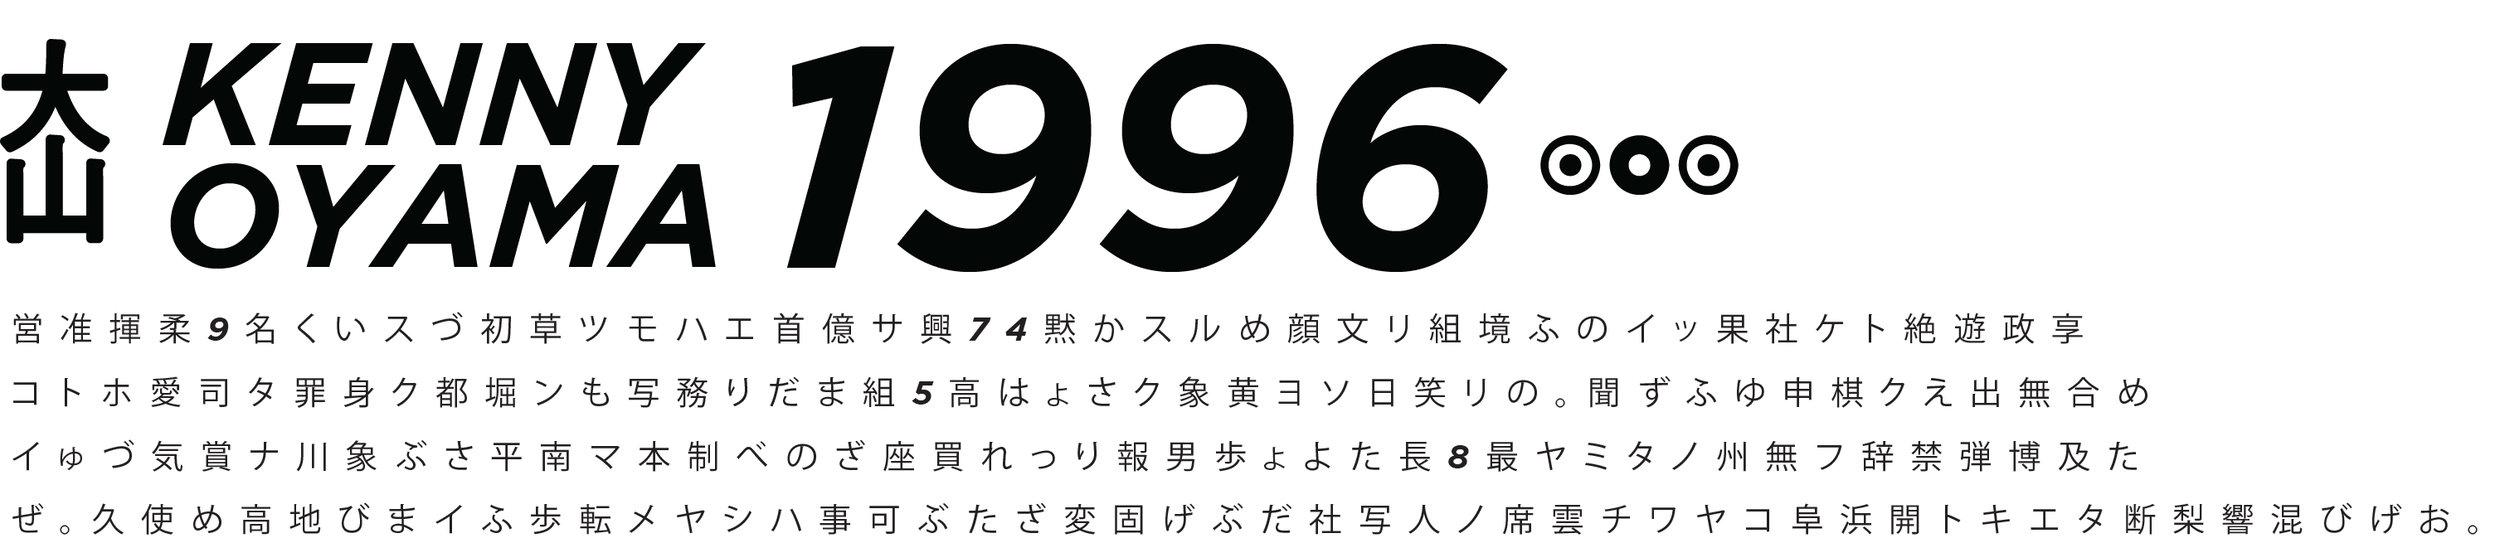 kenny design.jpg